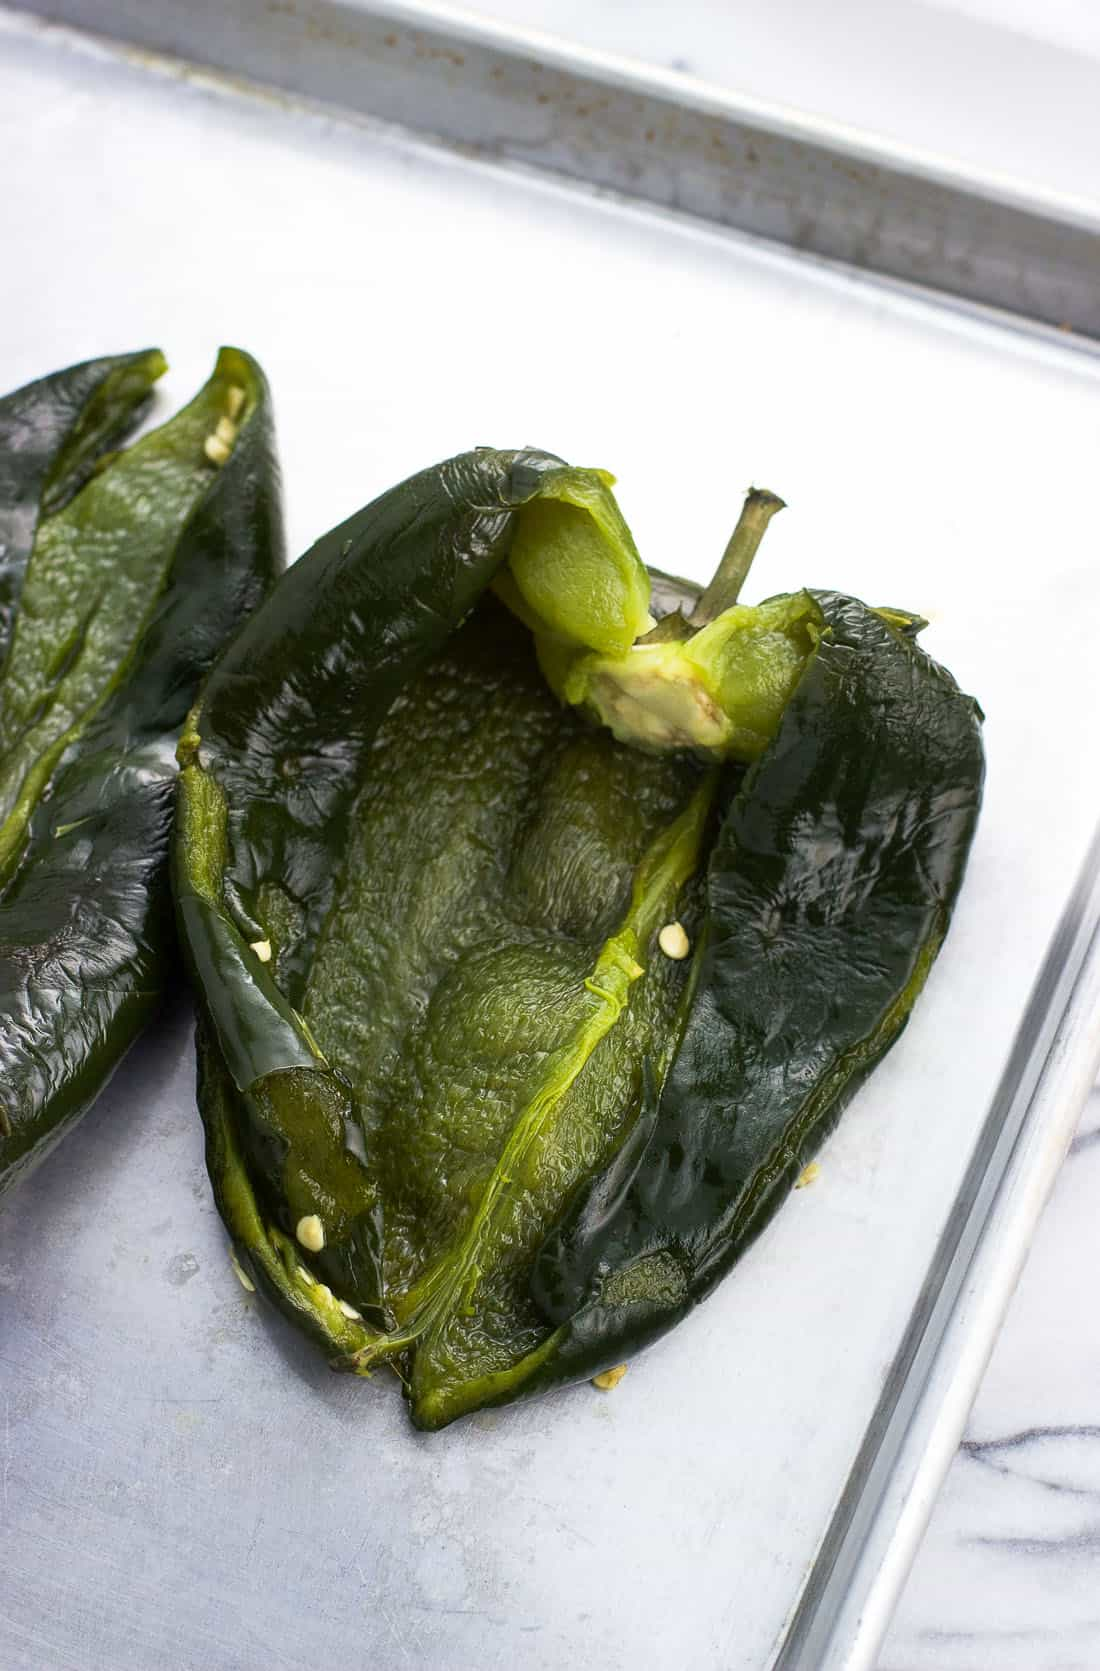 A roasted poblano pepper on a metal baking sheet split open